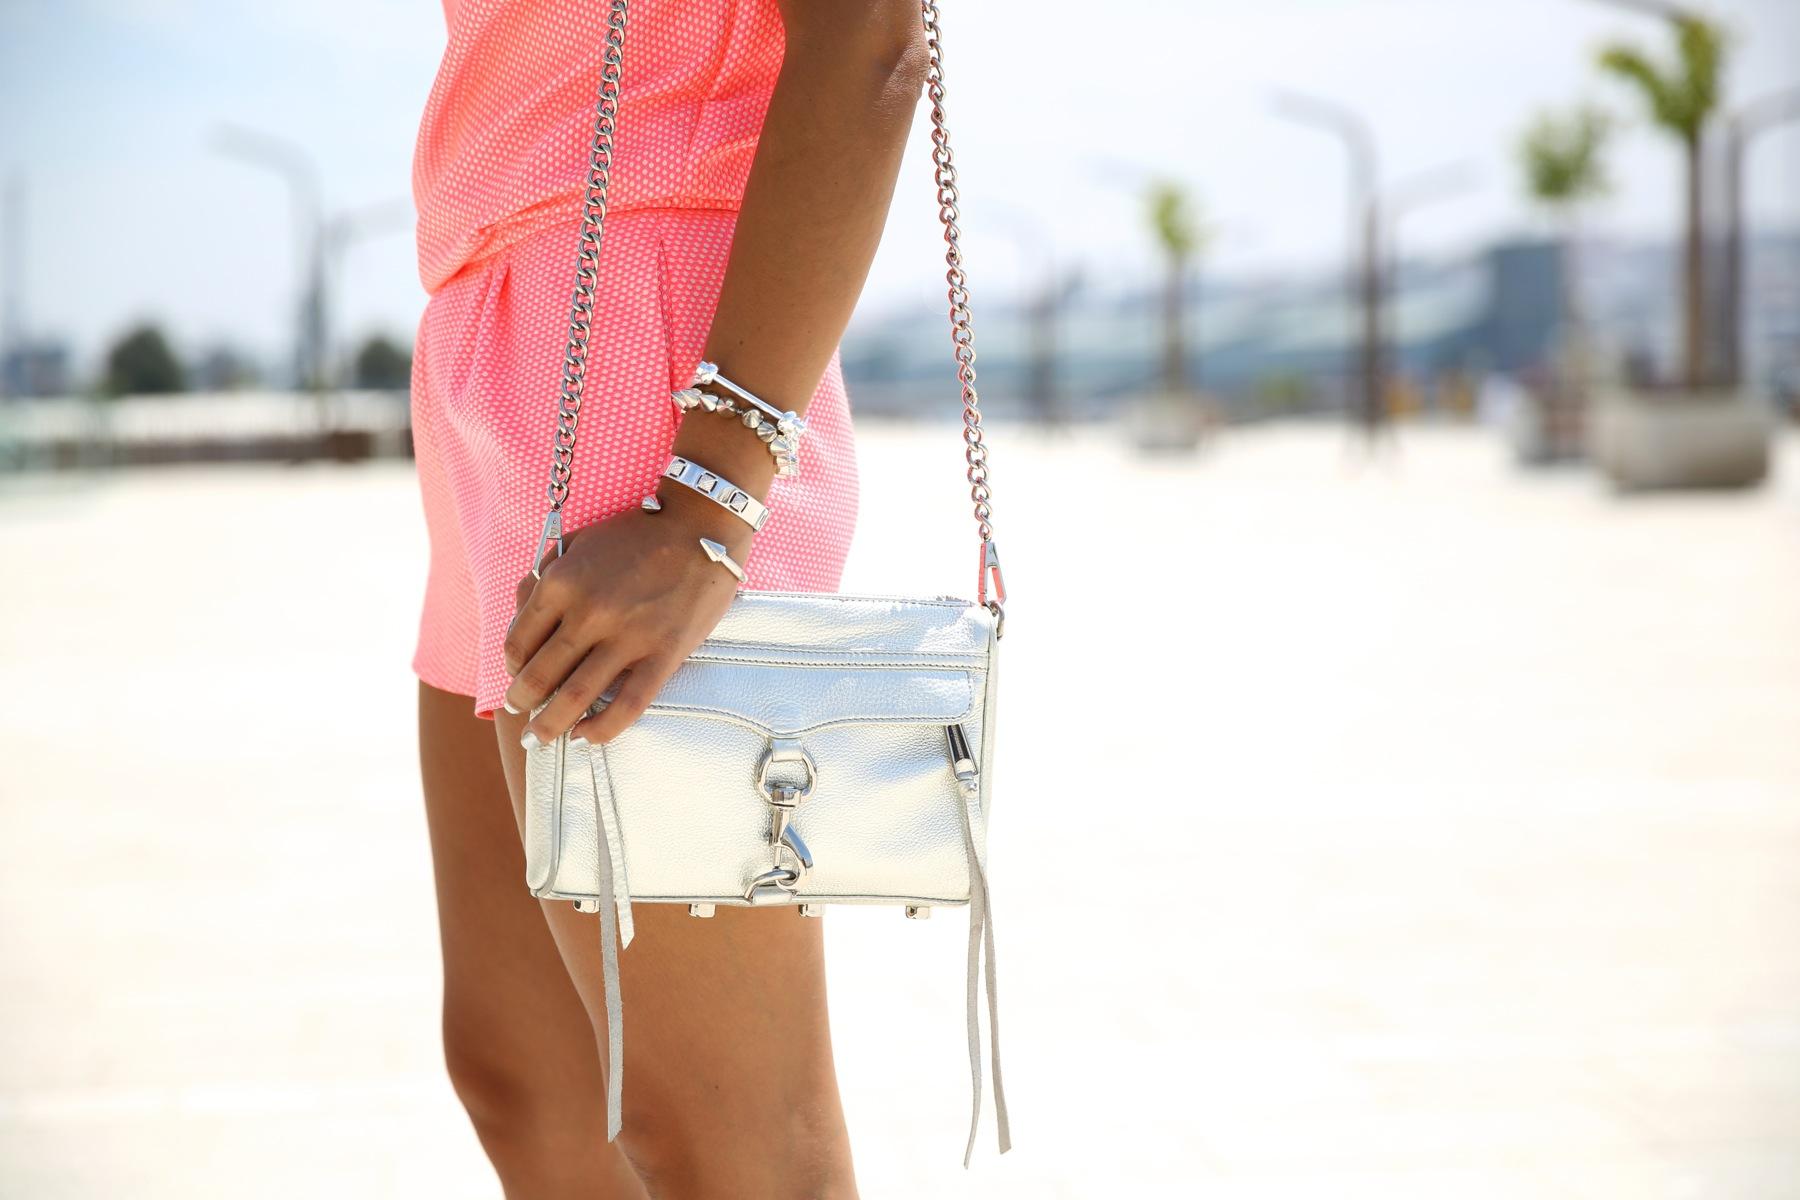 trendy_taste-look-outfit-street_style-ootd-blog-blogger-fashion_spain-moda_españa-silver_bag-bolso_plata-mono_rosa-mekdes-coruña-marina-2